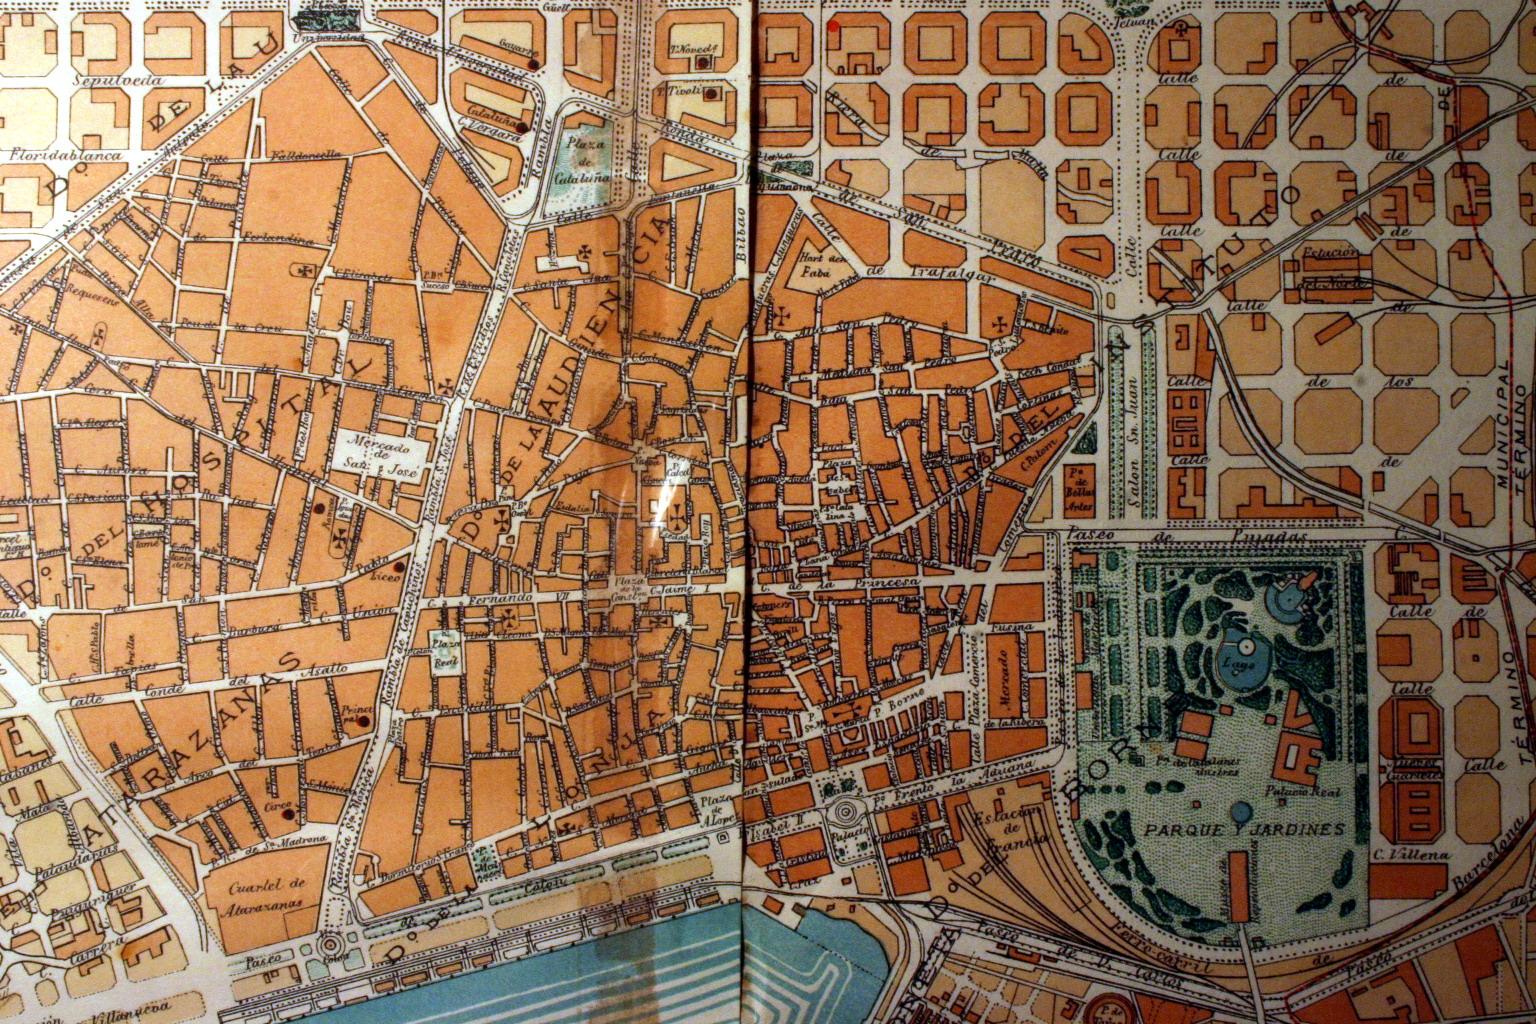 File:Barcelona - planol ciutat vella 1860.jpg - Wikimedia ...